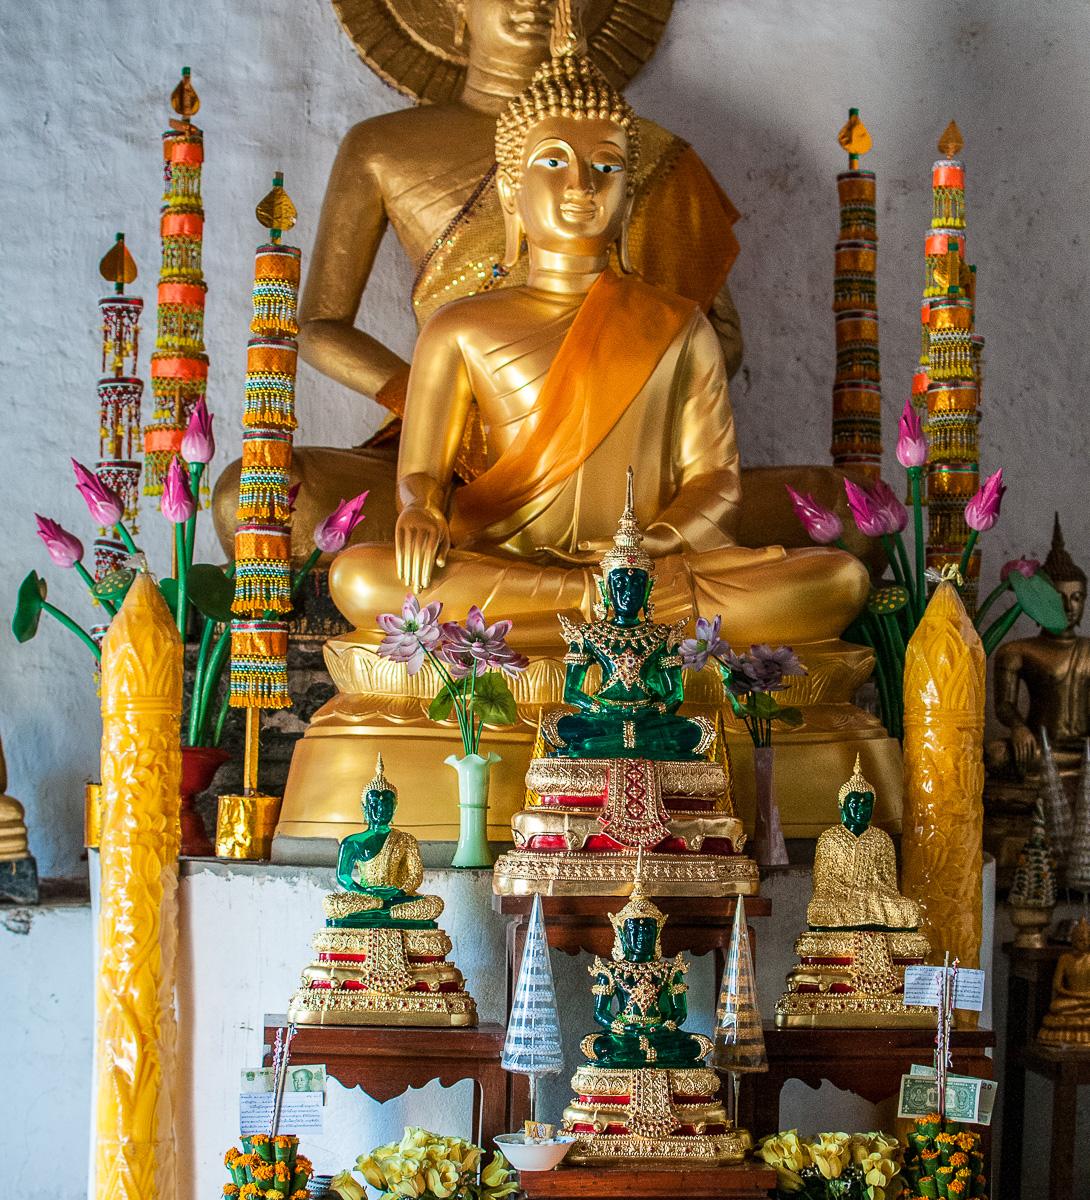 Buddhist Temple, near Laung Prabang, Laos